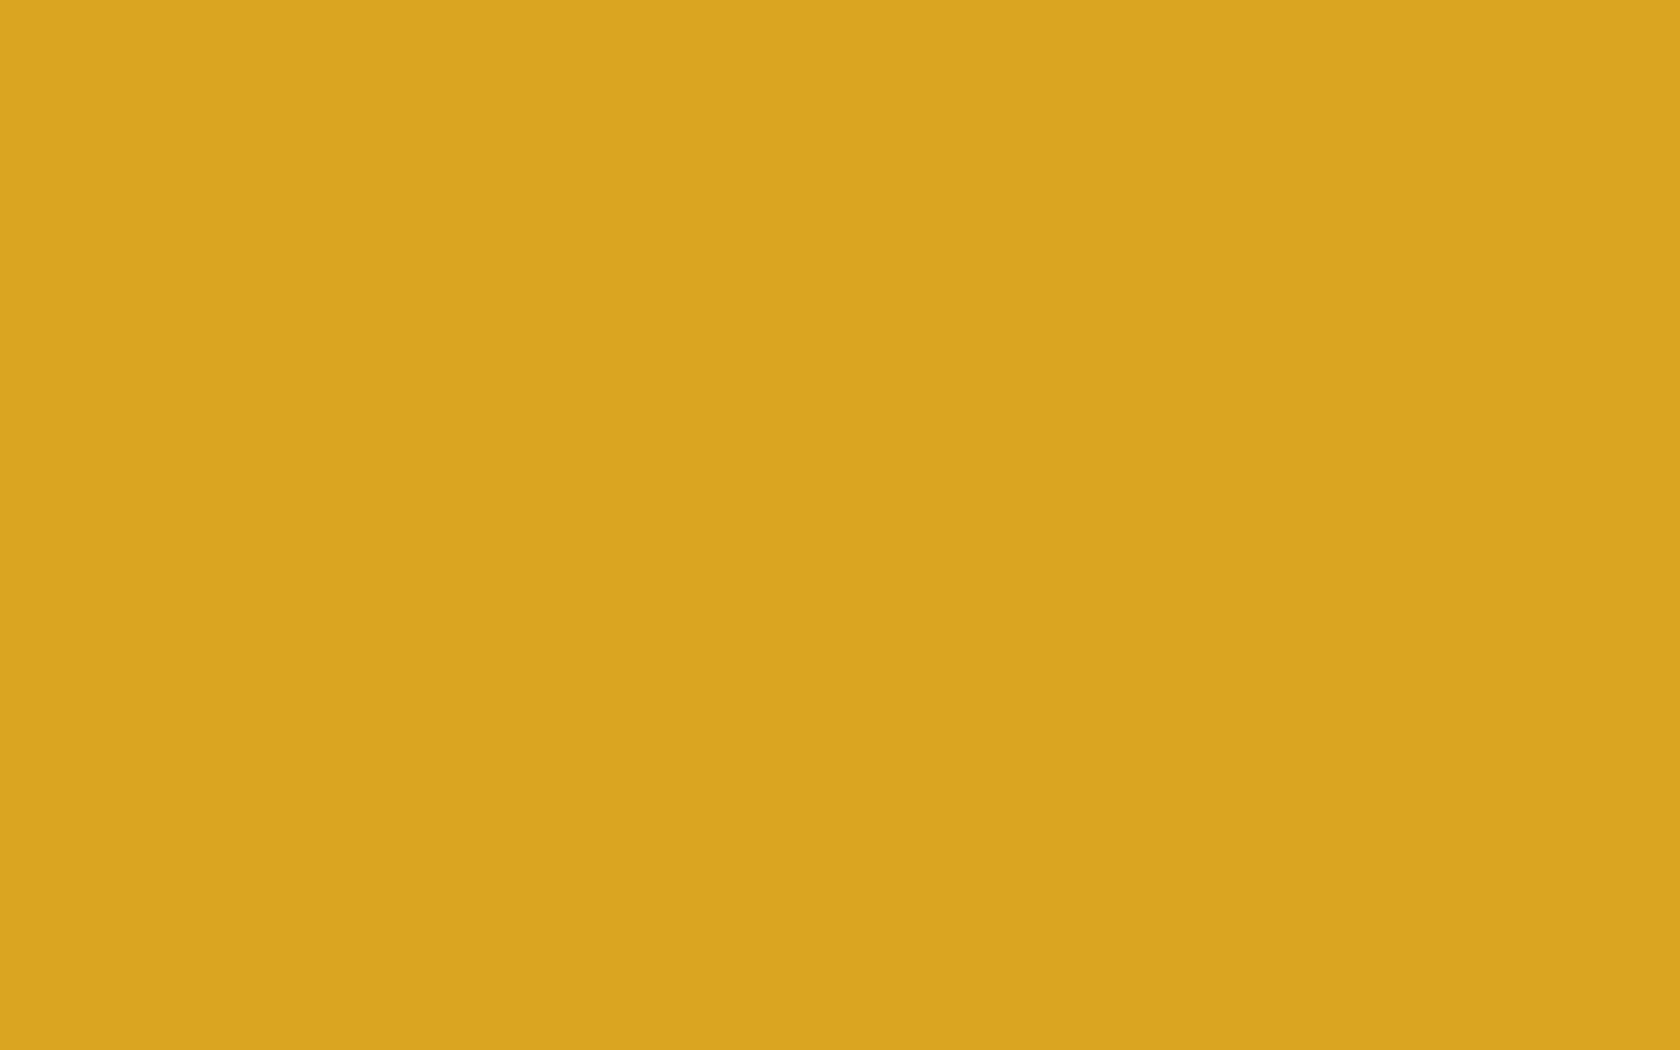 1680x1050 Goldenrod Solid Color Background